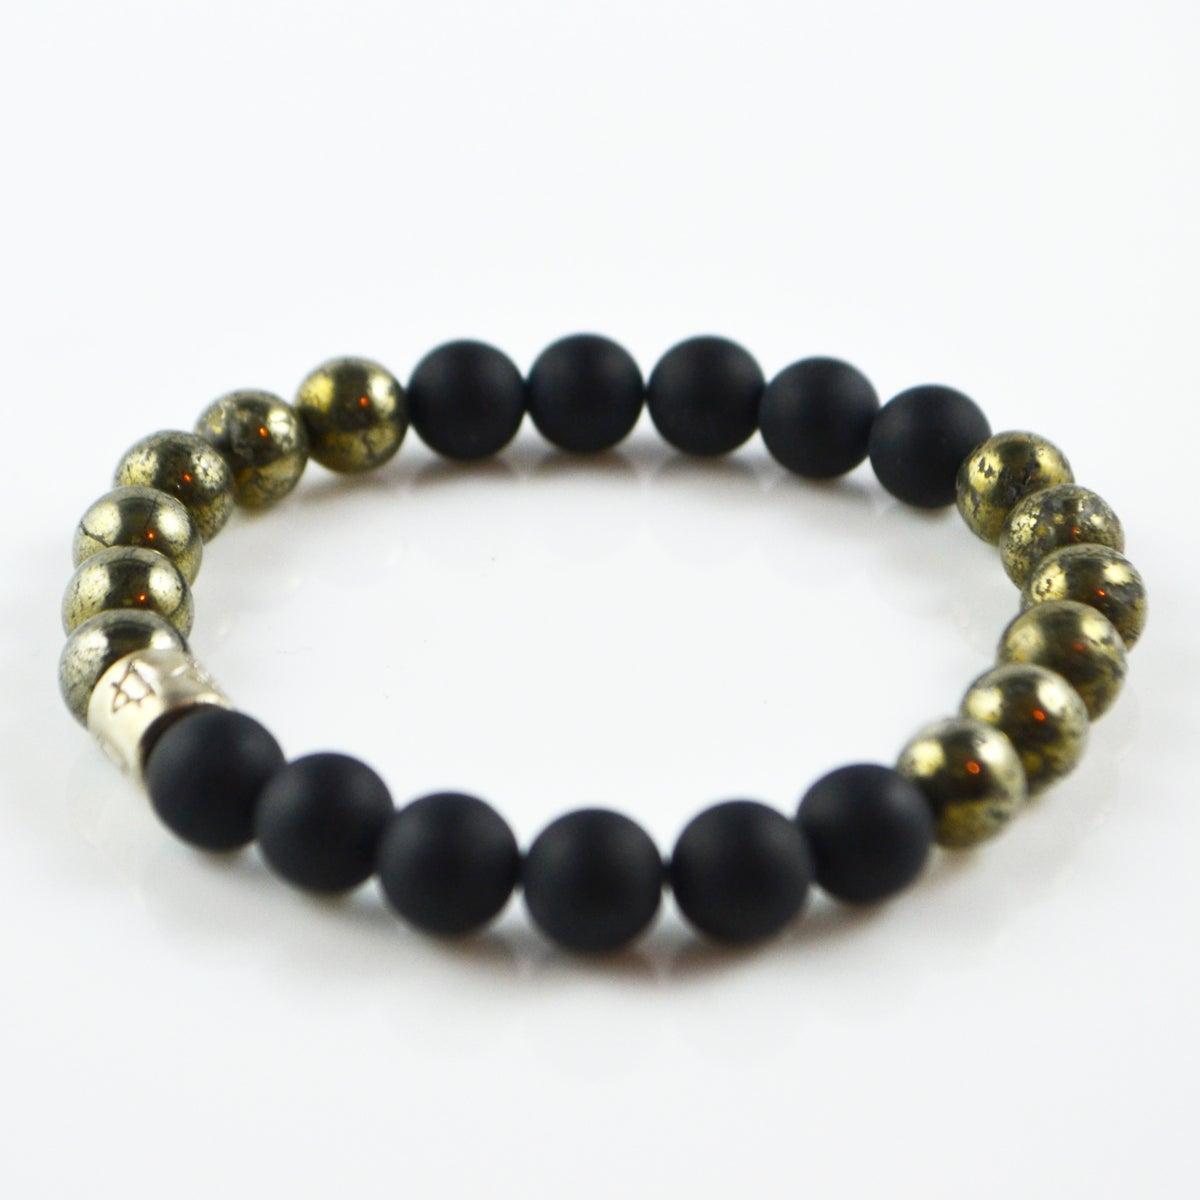 Image of Black Onyx and Pyrite Bracelet